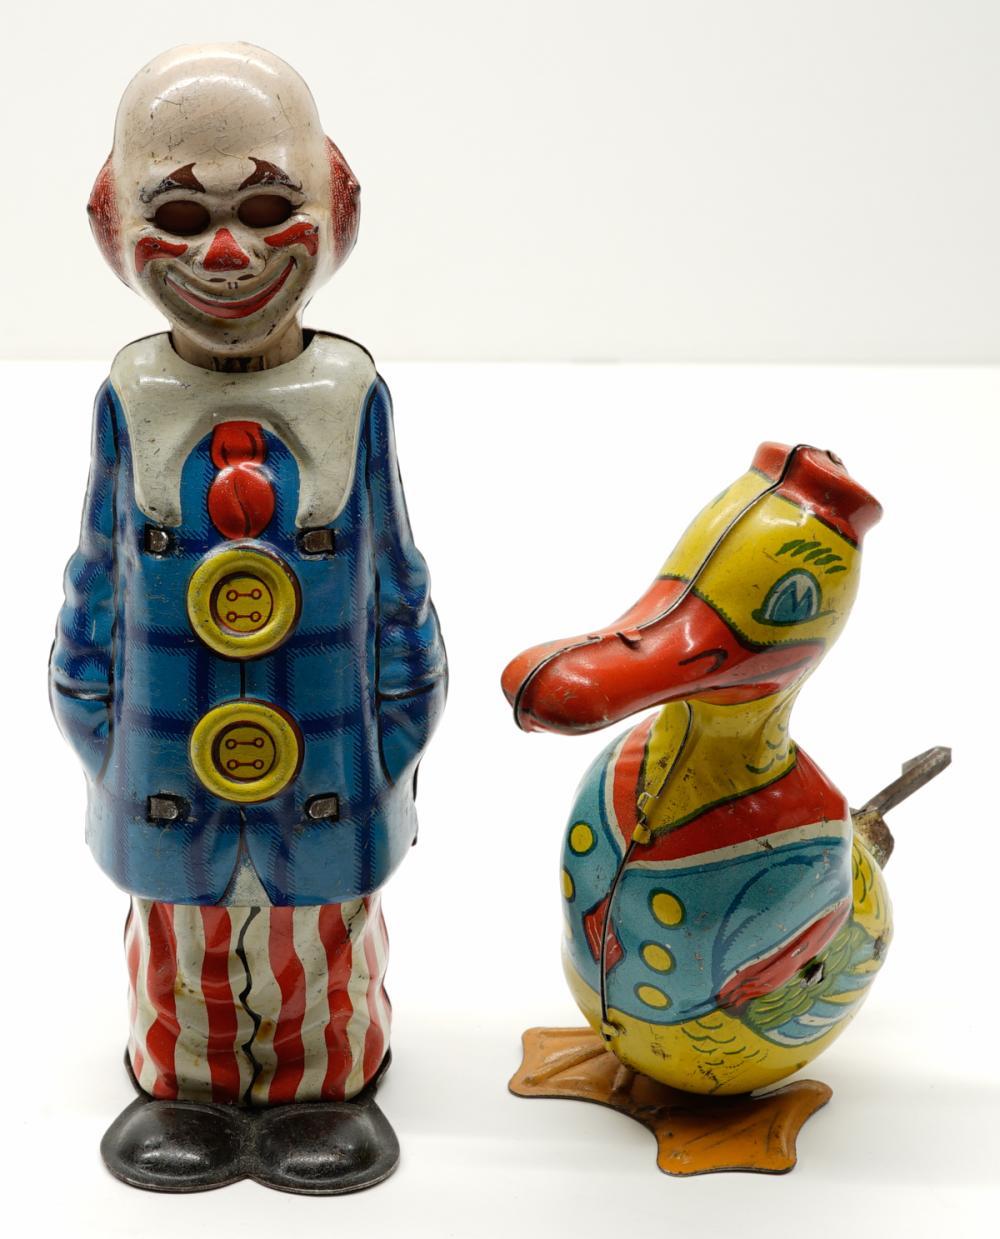 Lot 204: Germany U.S. Zone Uncle Sam Clown